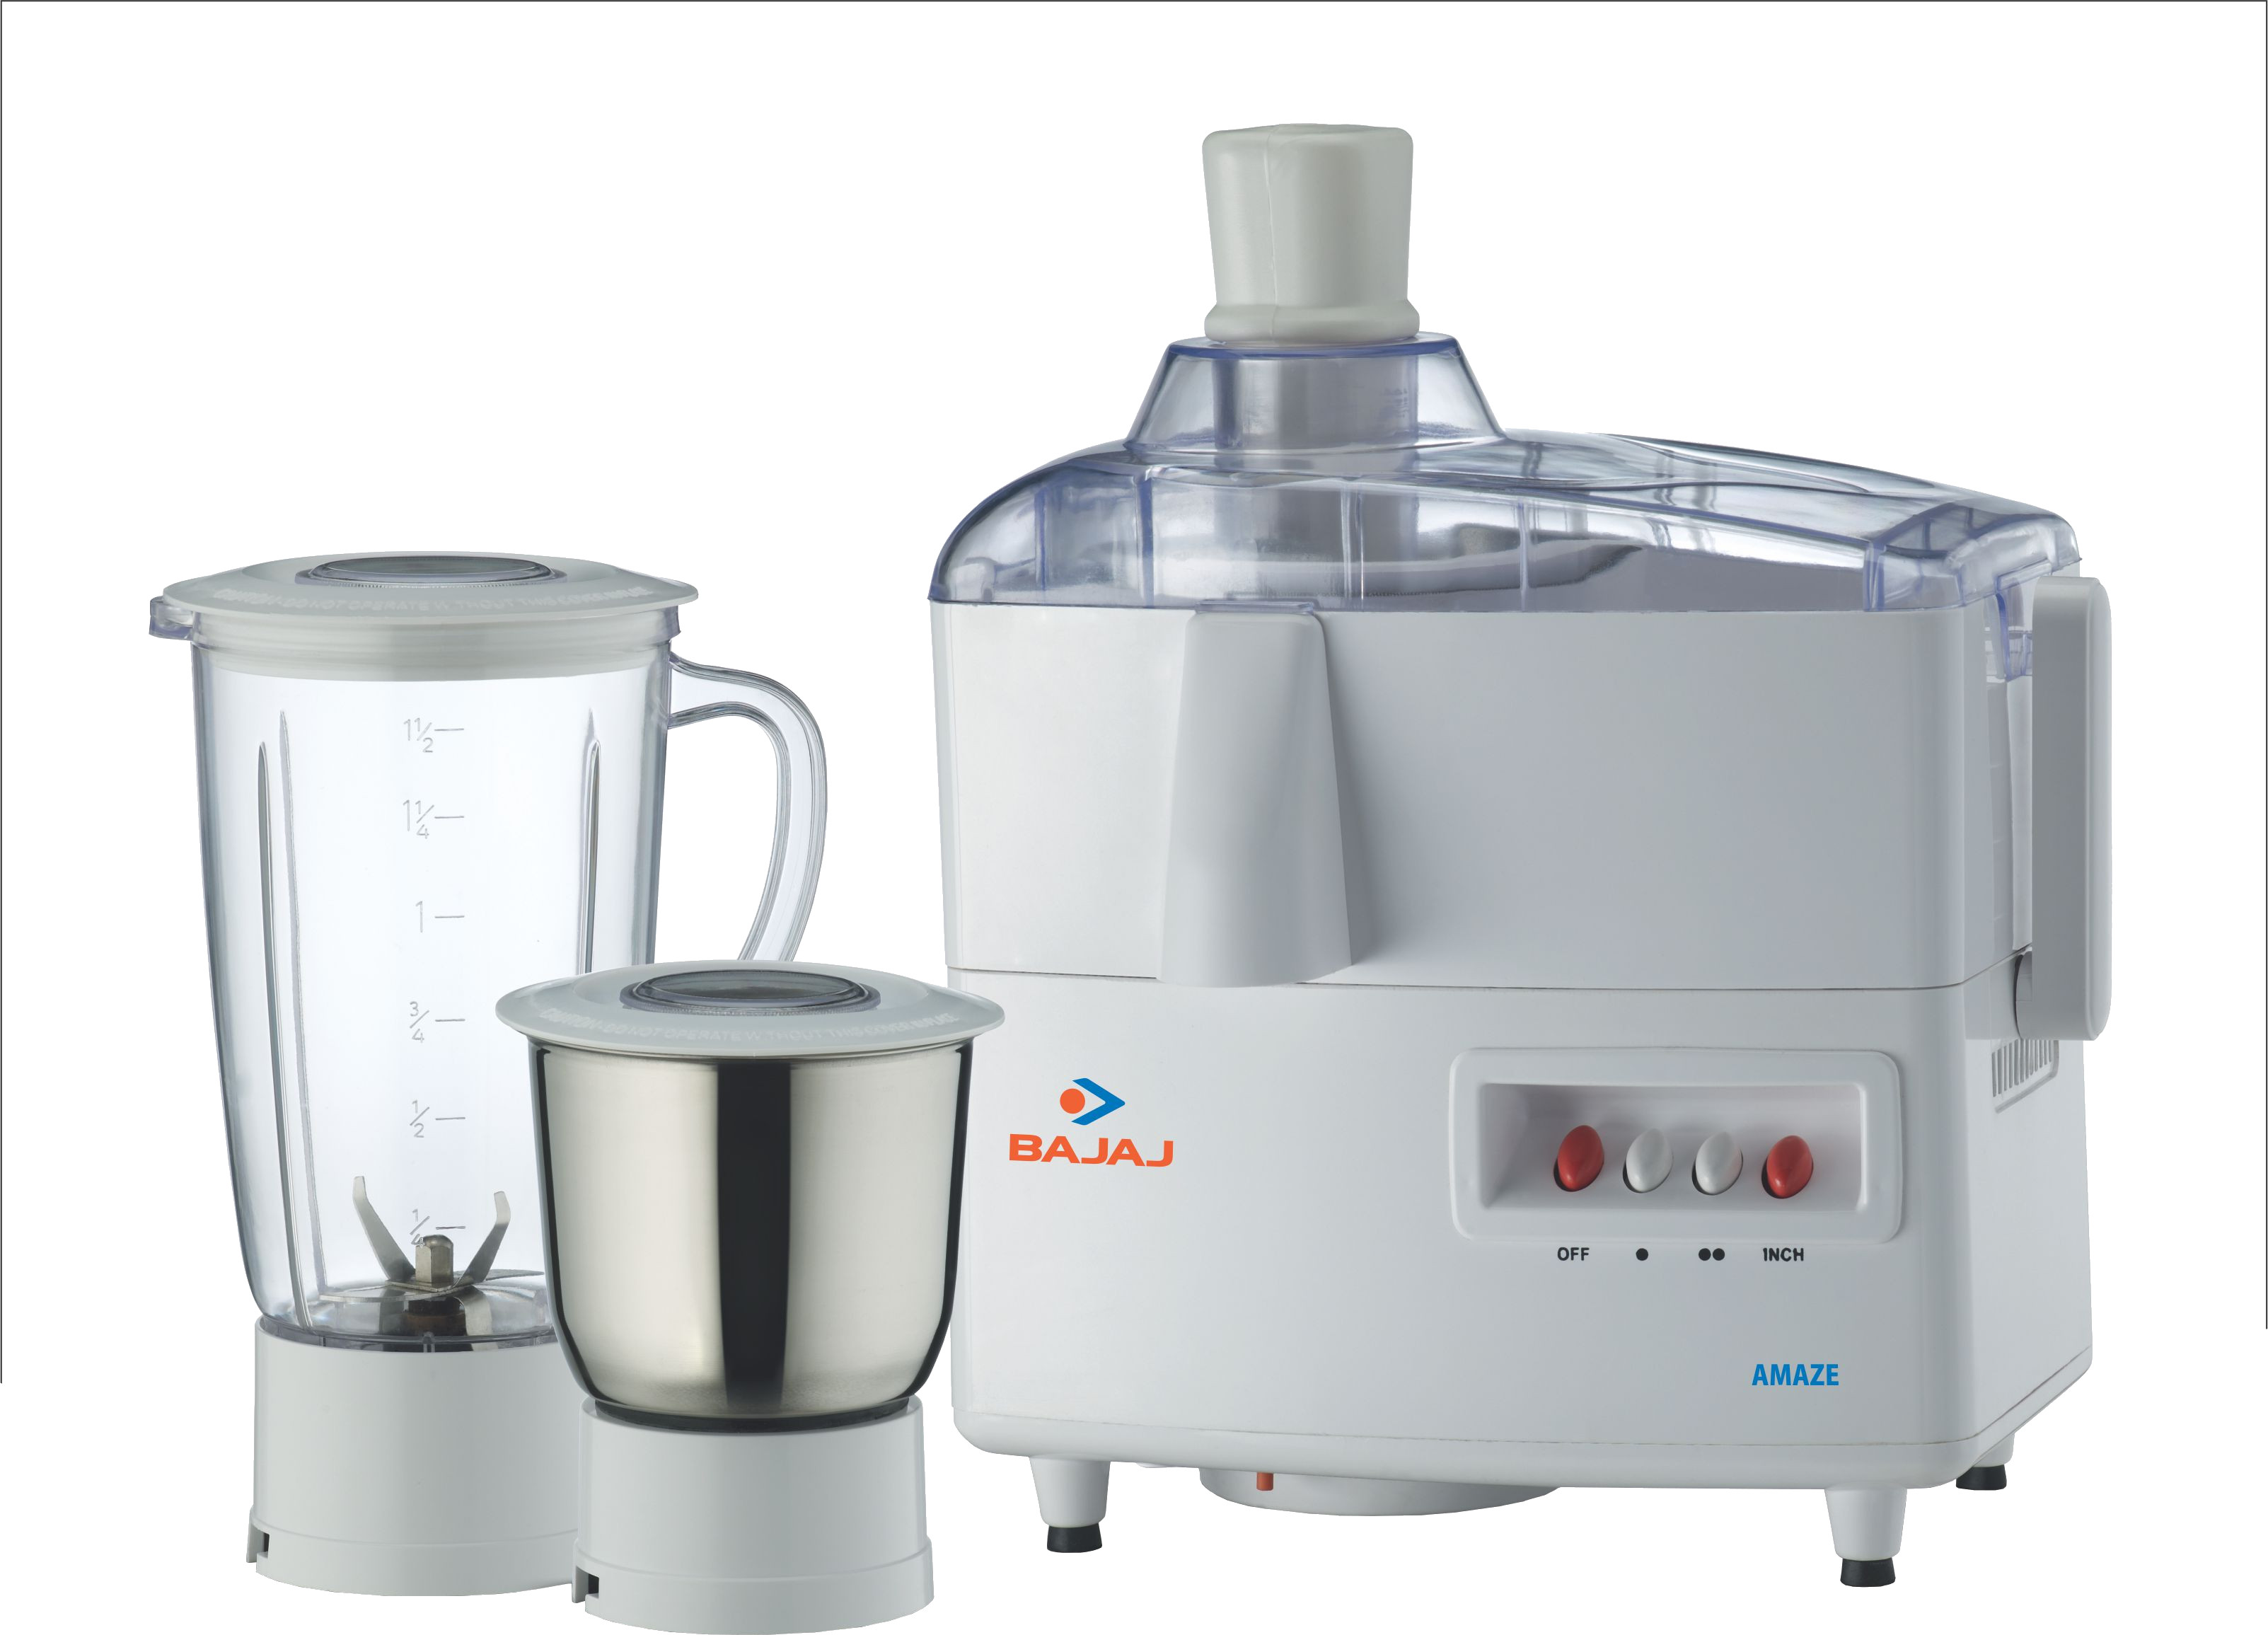 Bajaj Amaze Juicer Mixer Grinder 450 W Juicer Mixer Grinder(2 Jars)